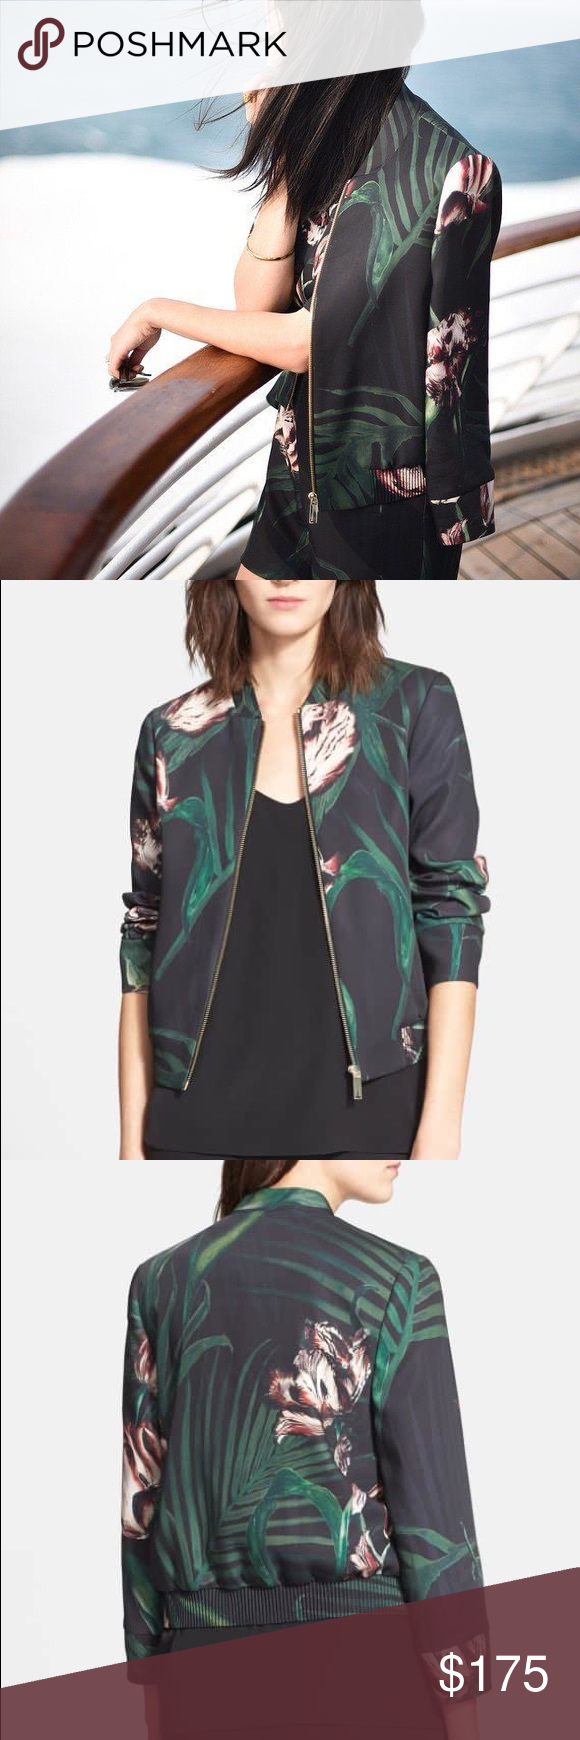 5e7e6d9e127b8 Ted Baker Azeeza Floral Print Bomber Jacket 🌺 Size 5